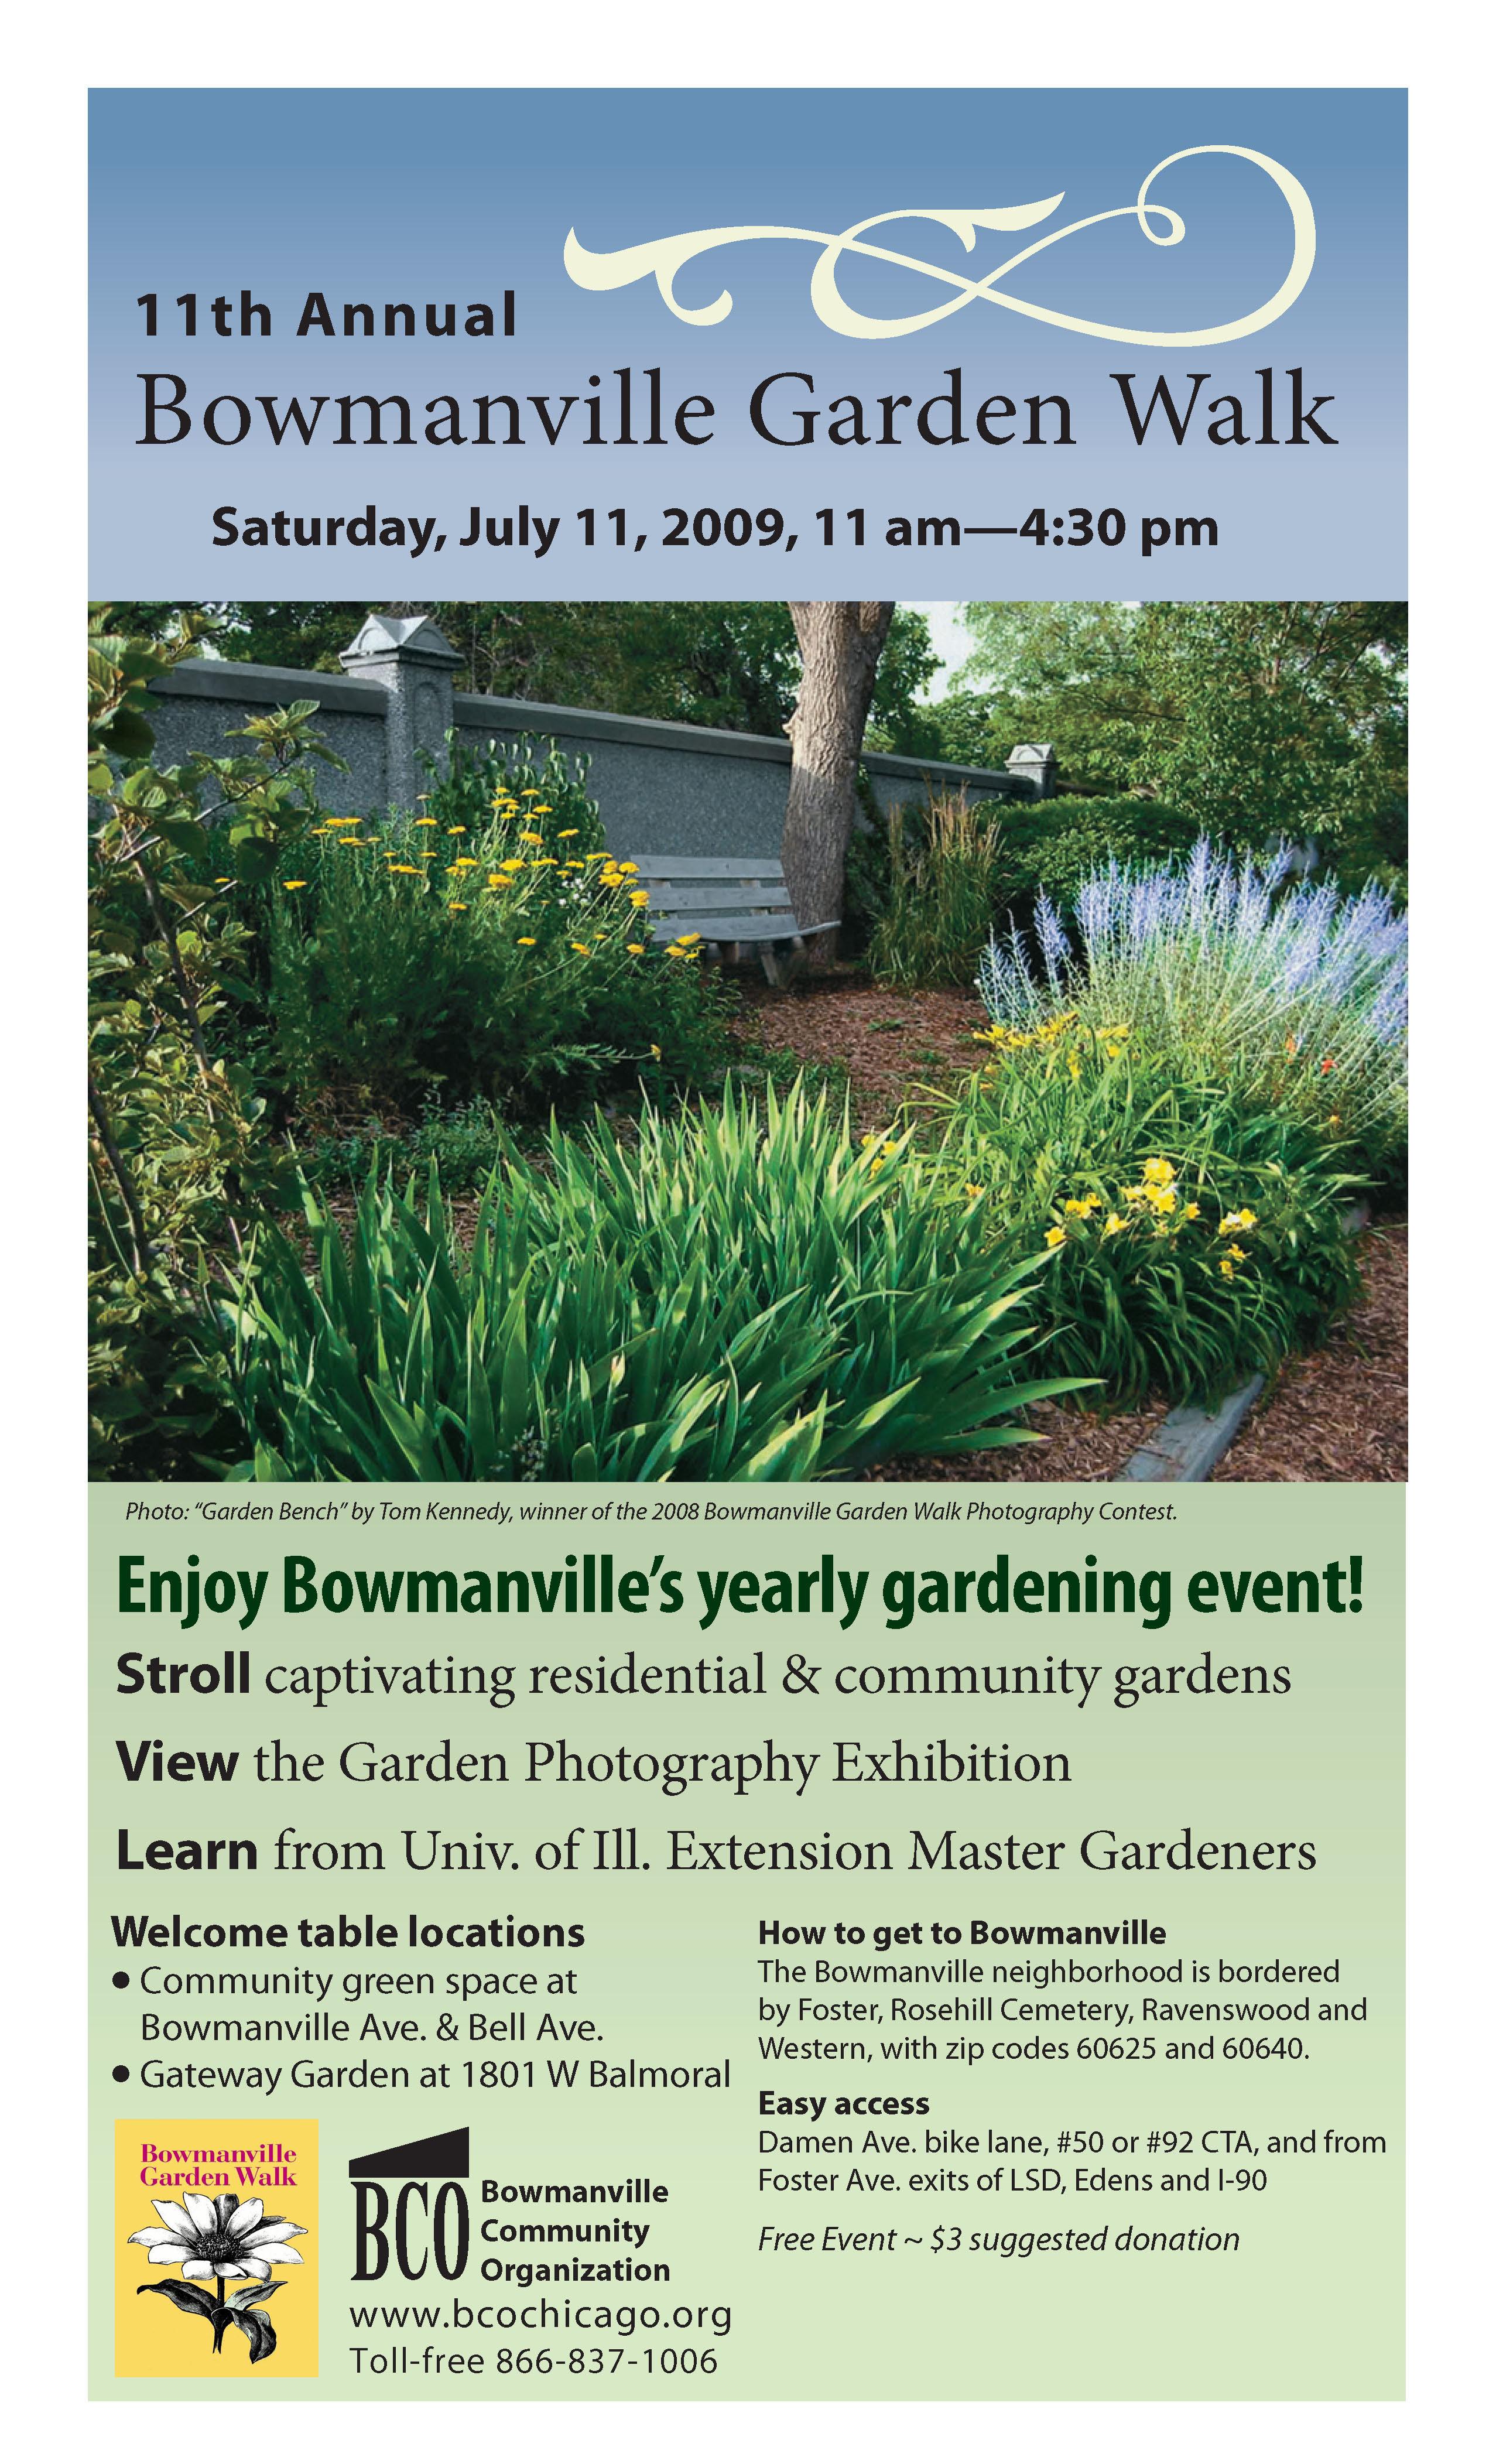 Bowmanville Community Organization 09 bco garden walk